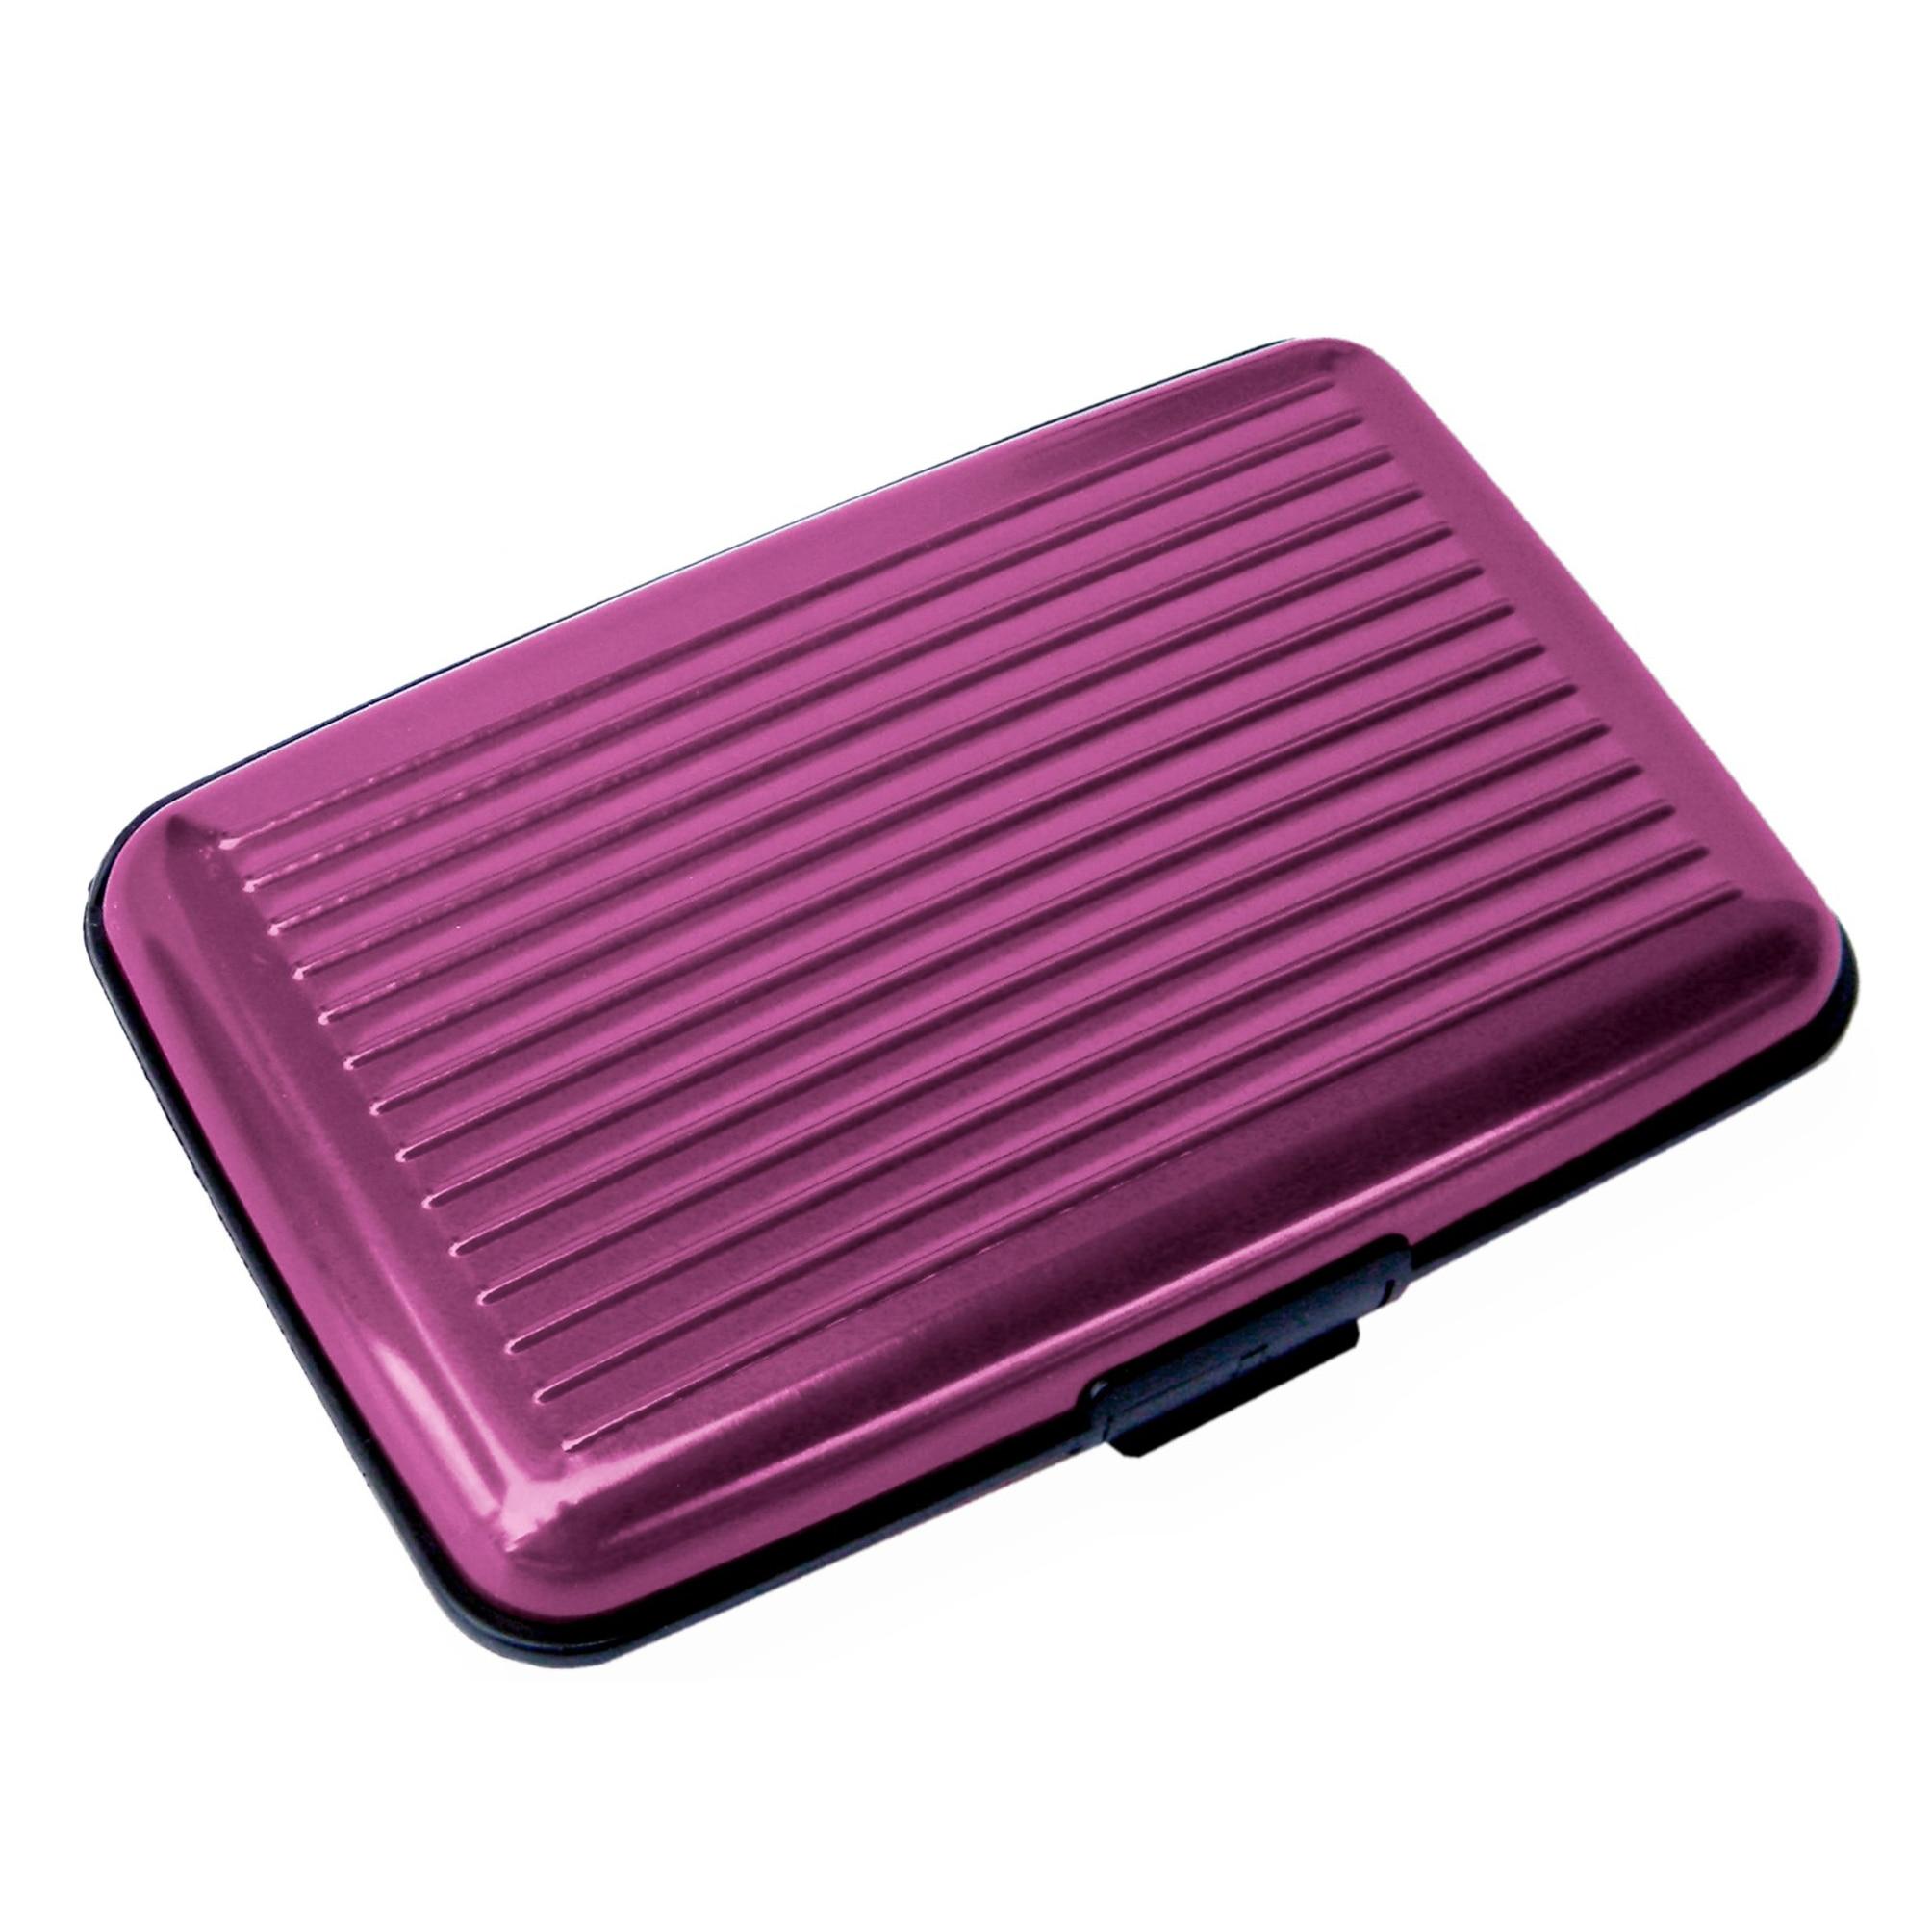 10pcs( ABDB Card Holder 2 smooth sides CB name card ALUMINIUM RIGID Security Credit Cards Holder Wallet * PURPLE